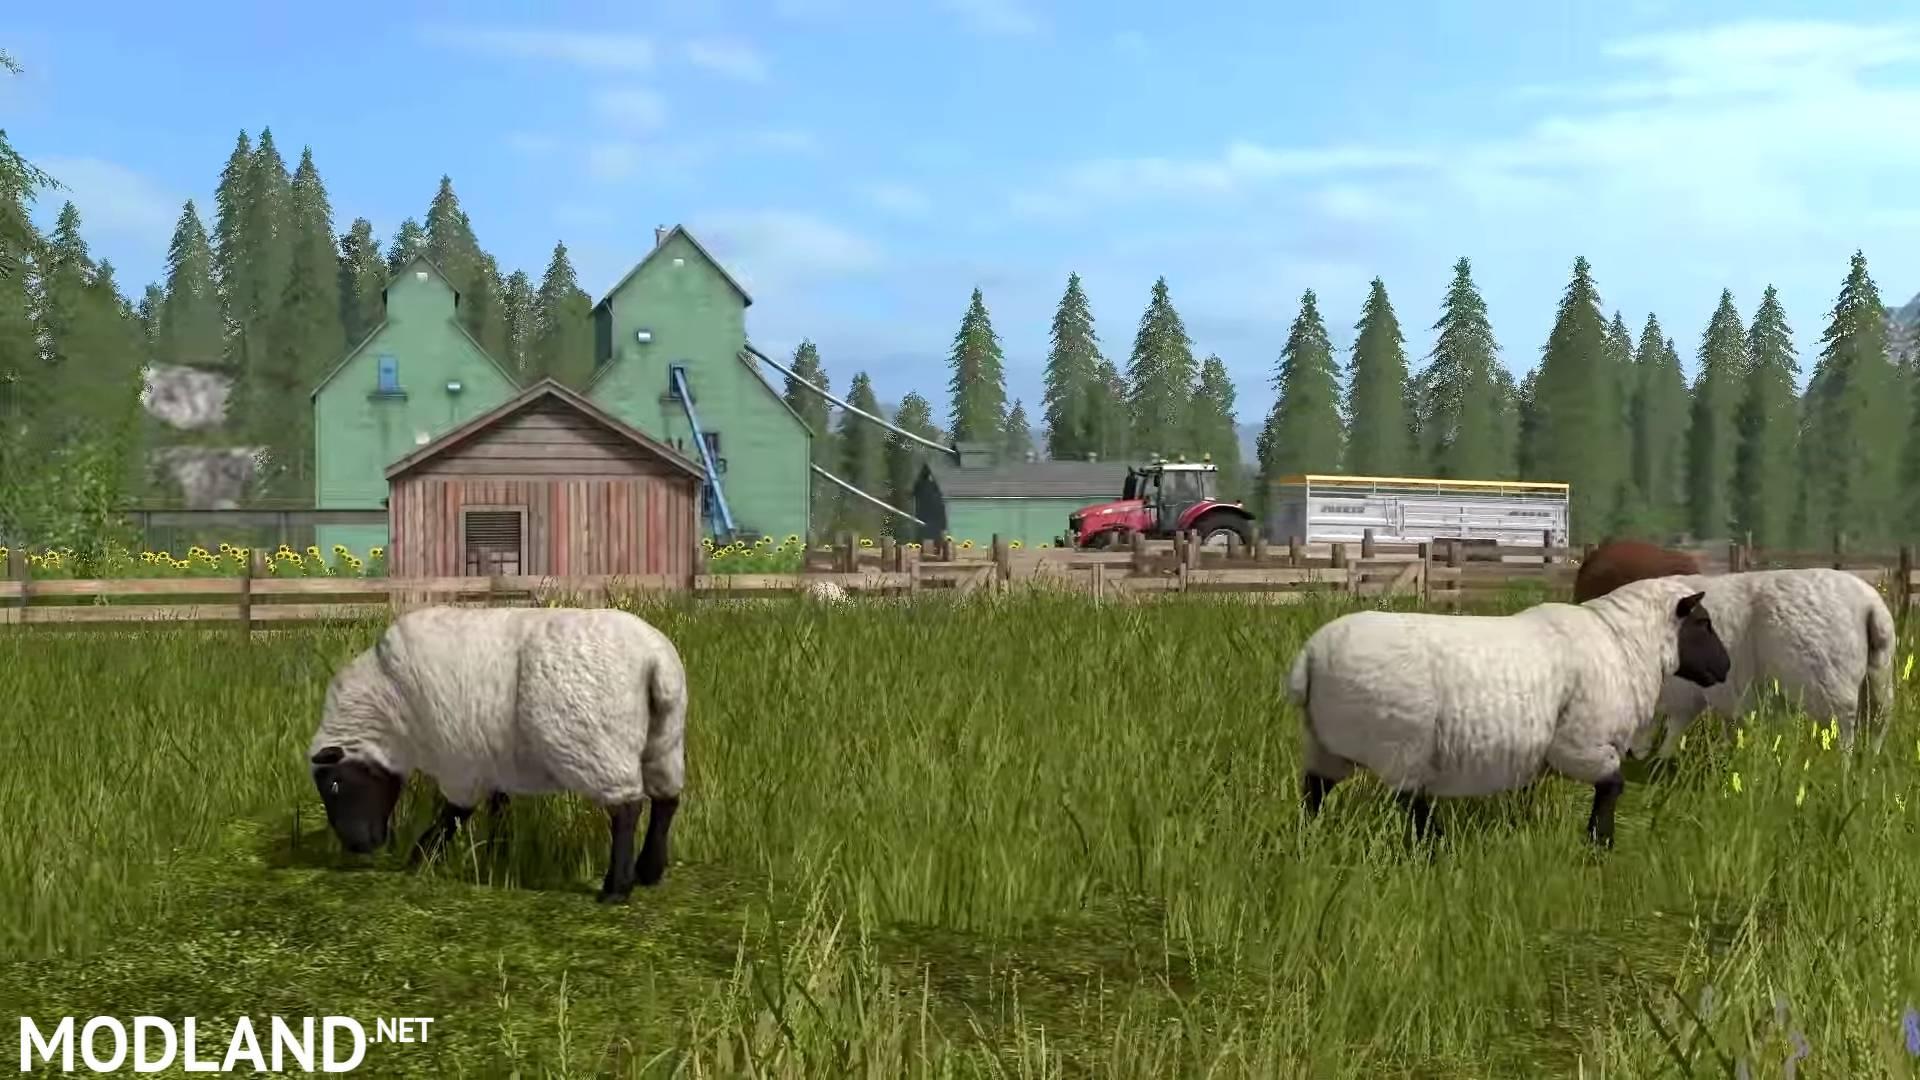 Farming Simulator 2017 Gameplay 2: Tending to Animals mod ...